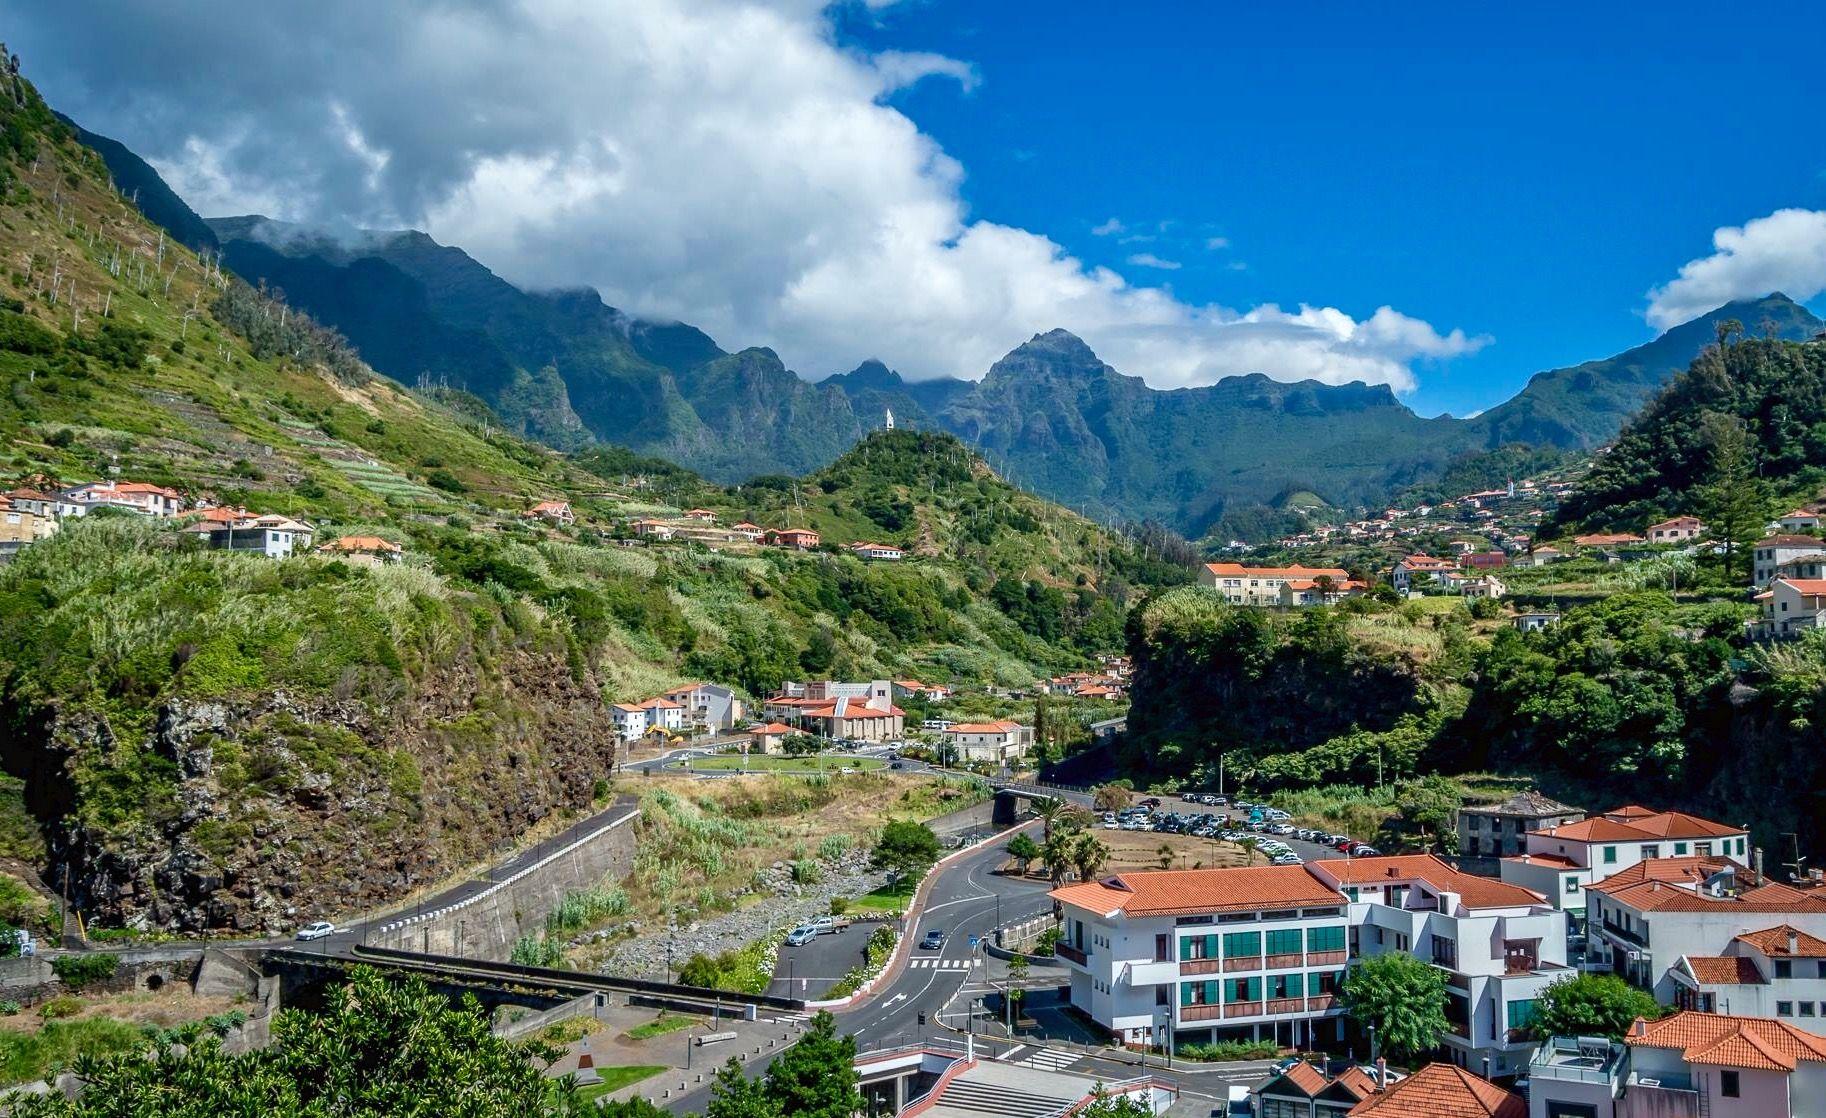 676275944bcb305f82046da37b0274bc - Hotel Ocean Gardens Portugal Madeira Funchal